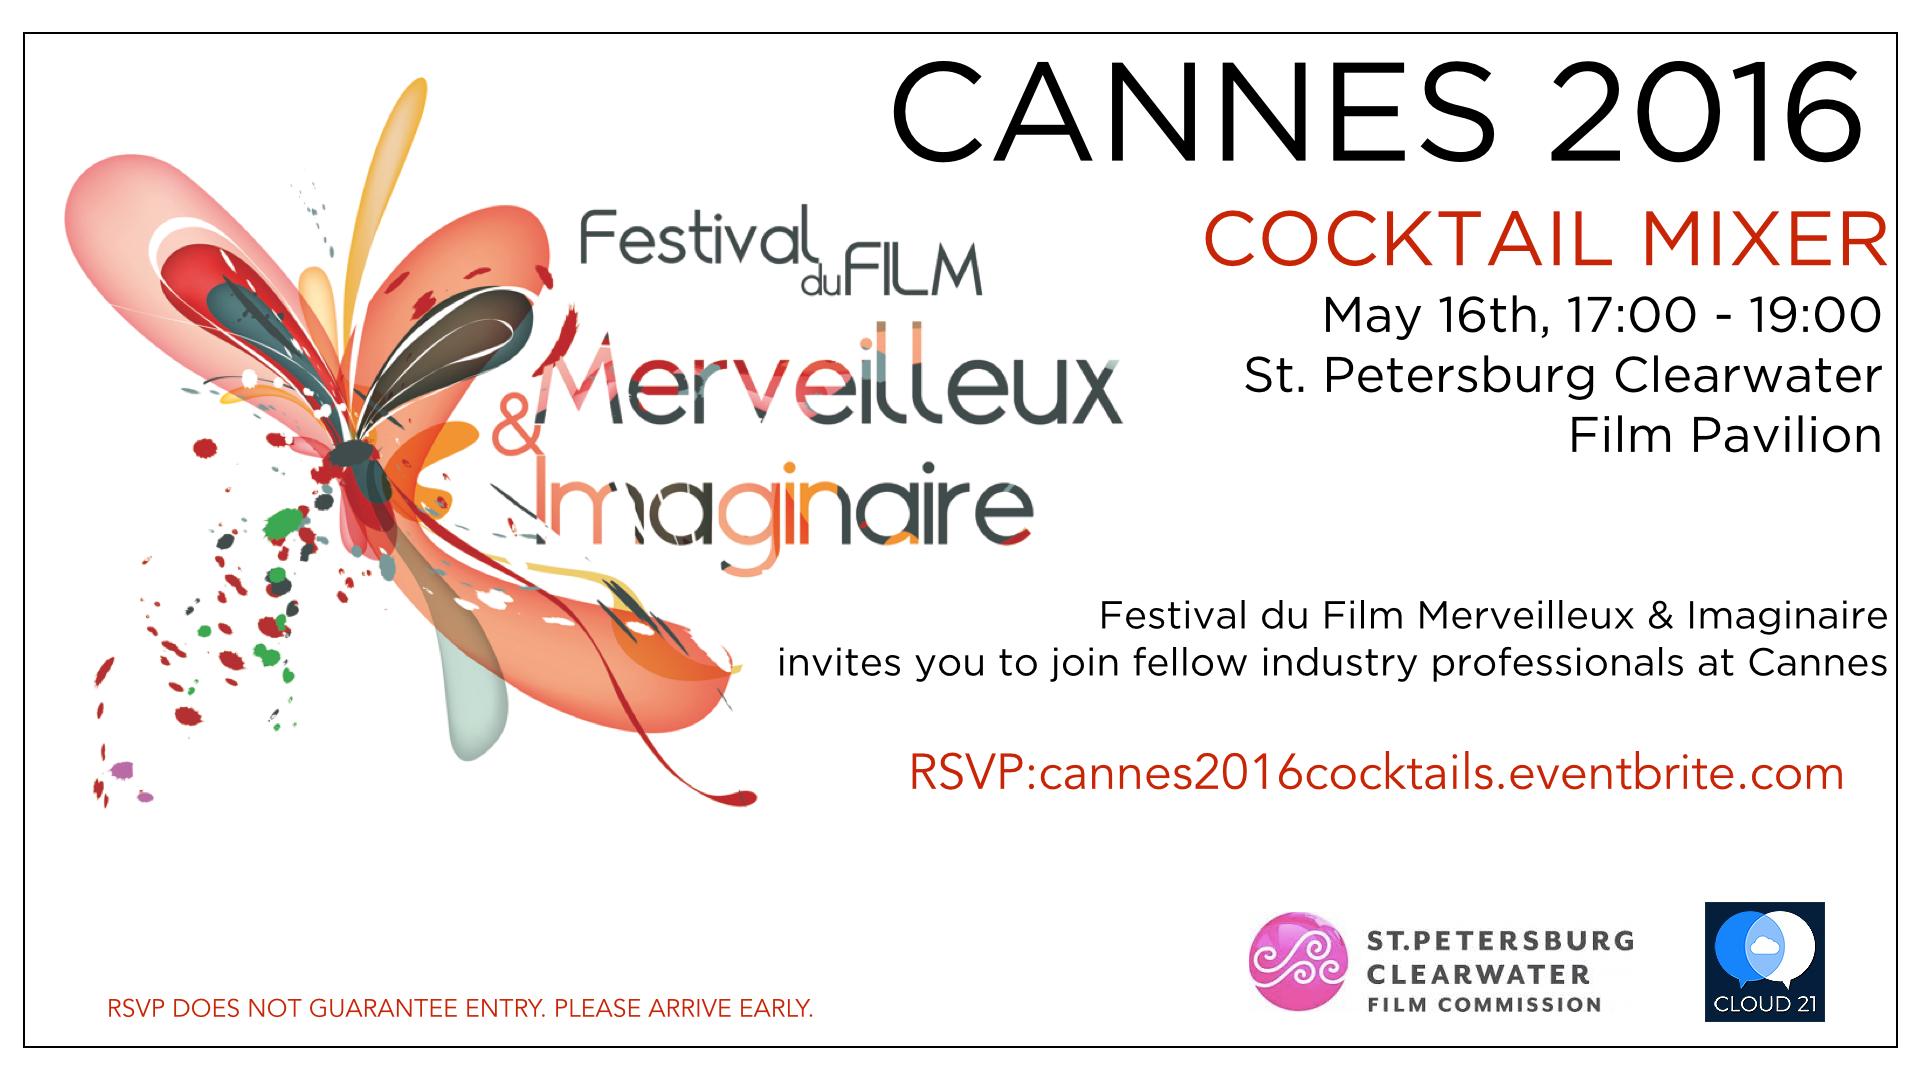 cannesfilmfestivalcocktailrsvp-1.jpg